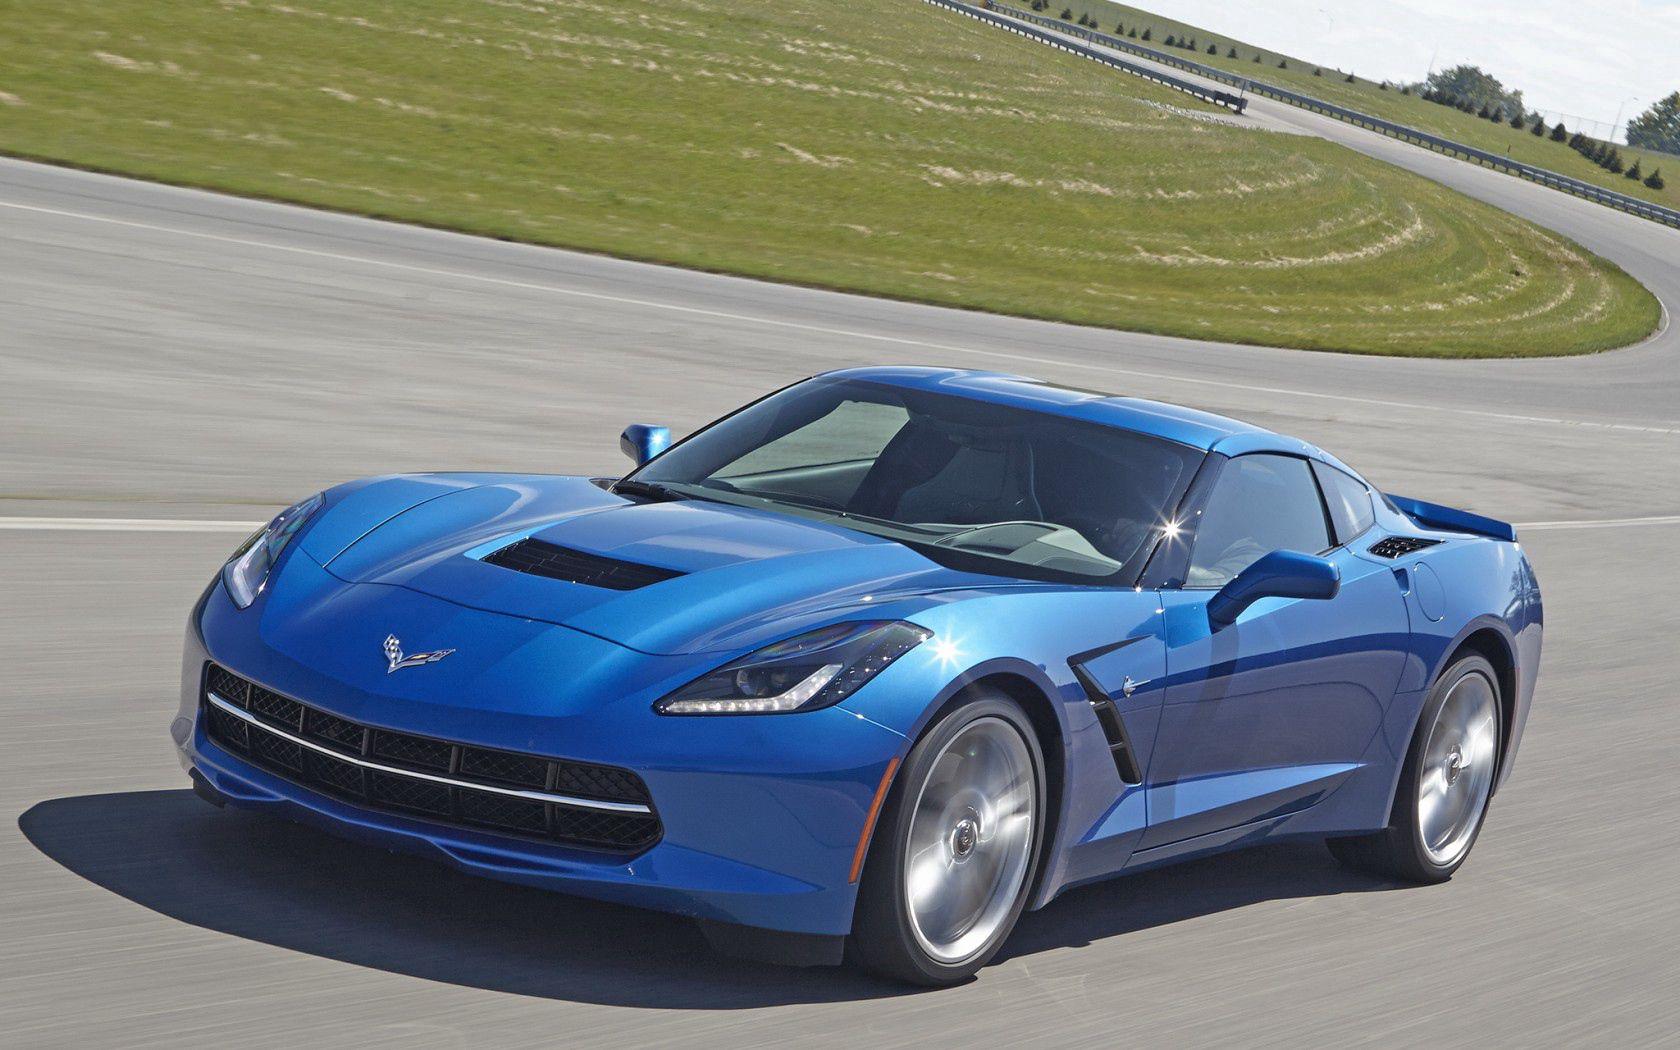 108189 скачать обои Шевроле (Chevrolet), Тачки (Cars), Corvette, C7, Stingray - заставки и картинки бесплатно